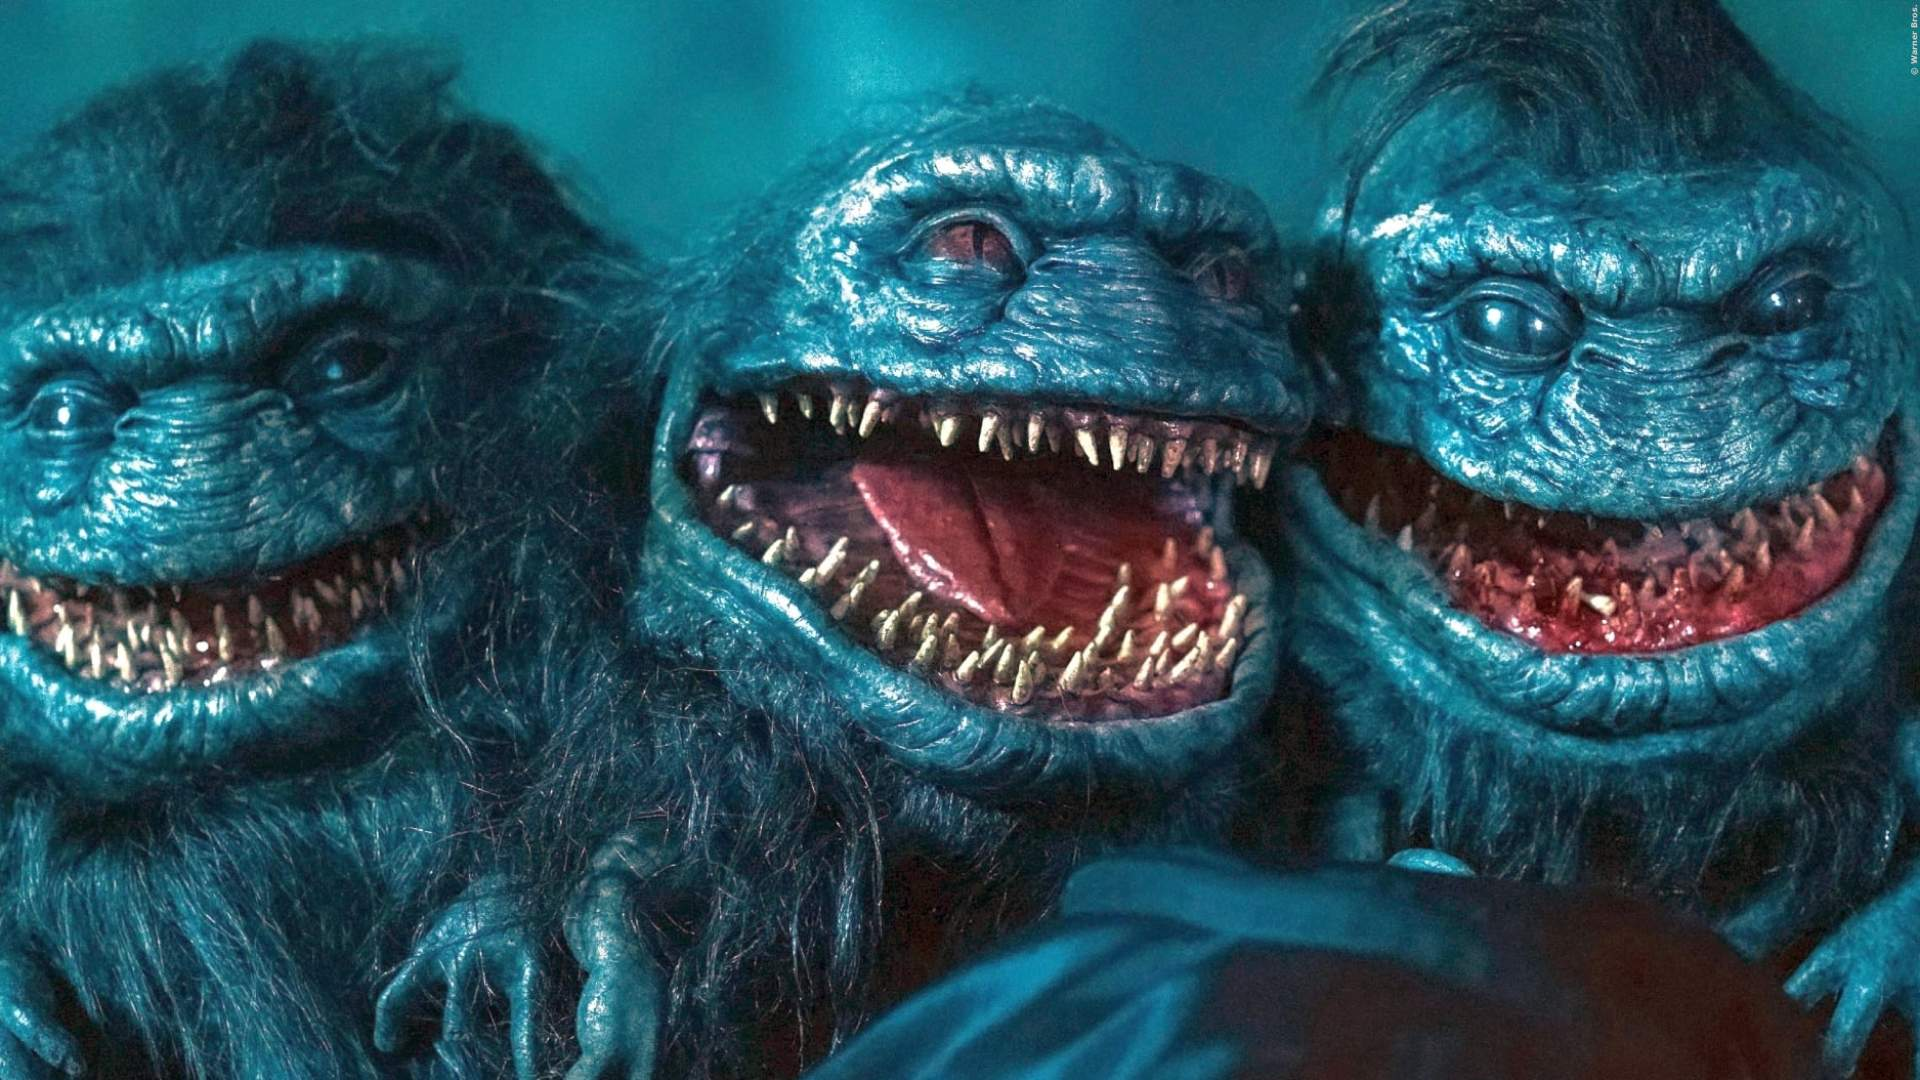 CRITTERS ATTACK: Erster Trailer zeigt die süßen Killer-Monster